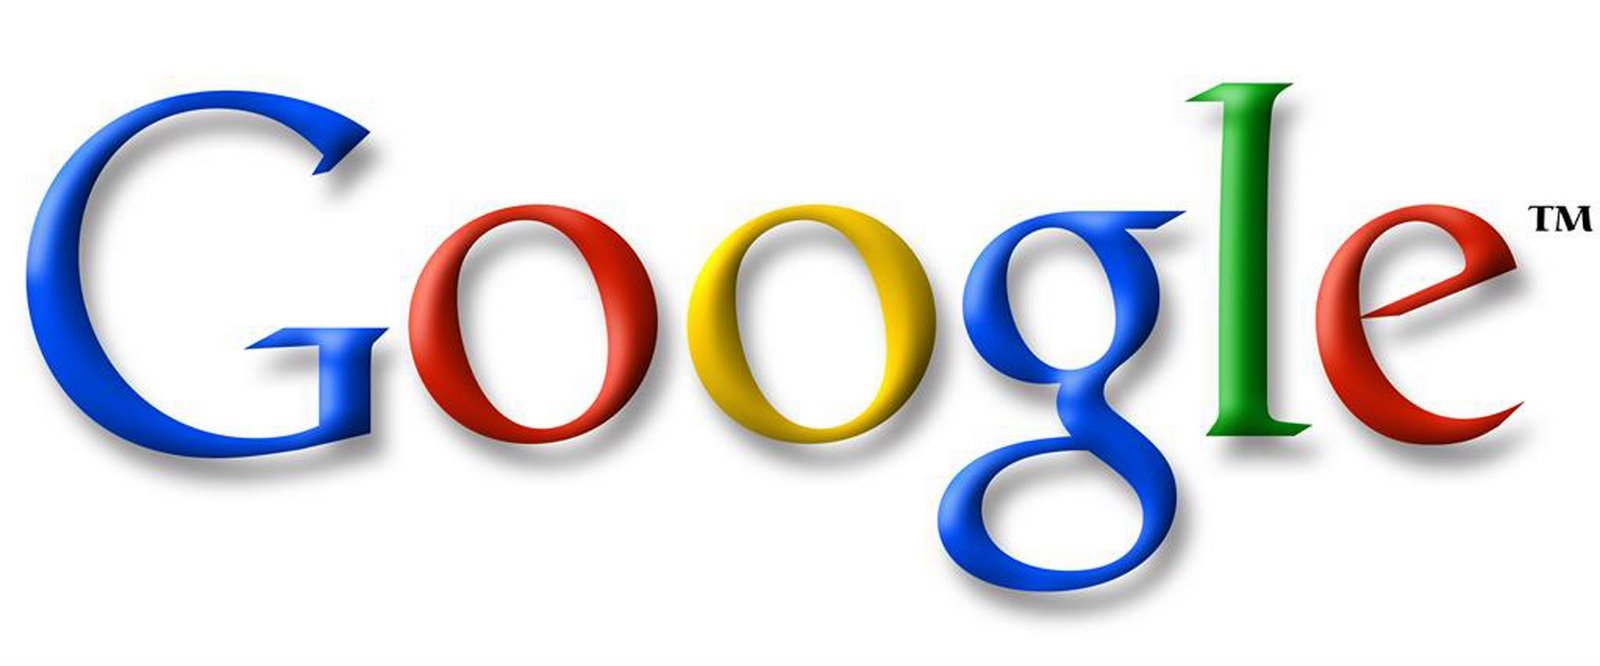 http://tecnologyc.com/wp-content/2009/11/google.jpg